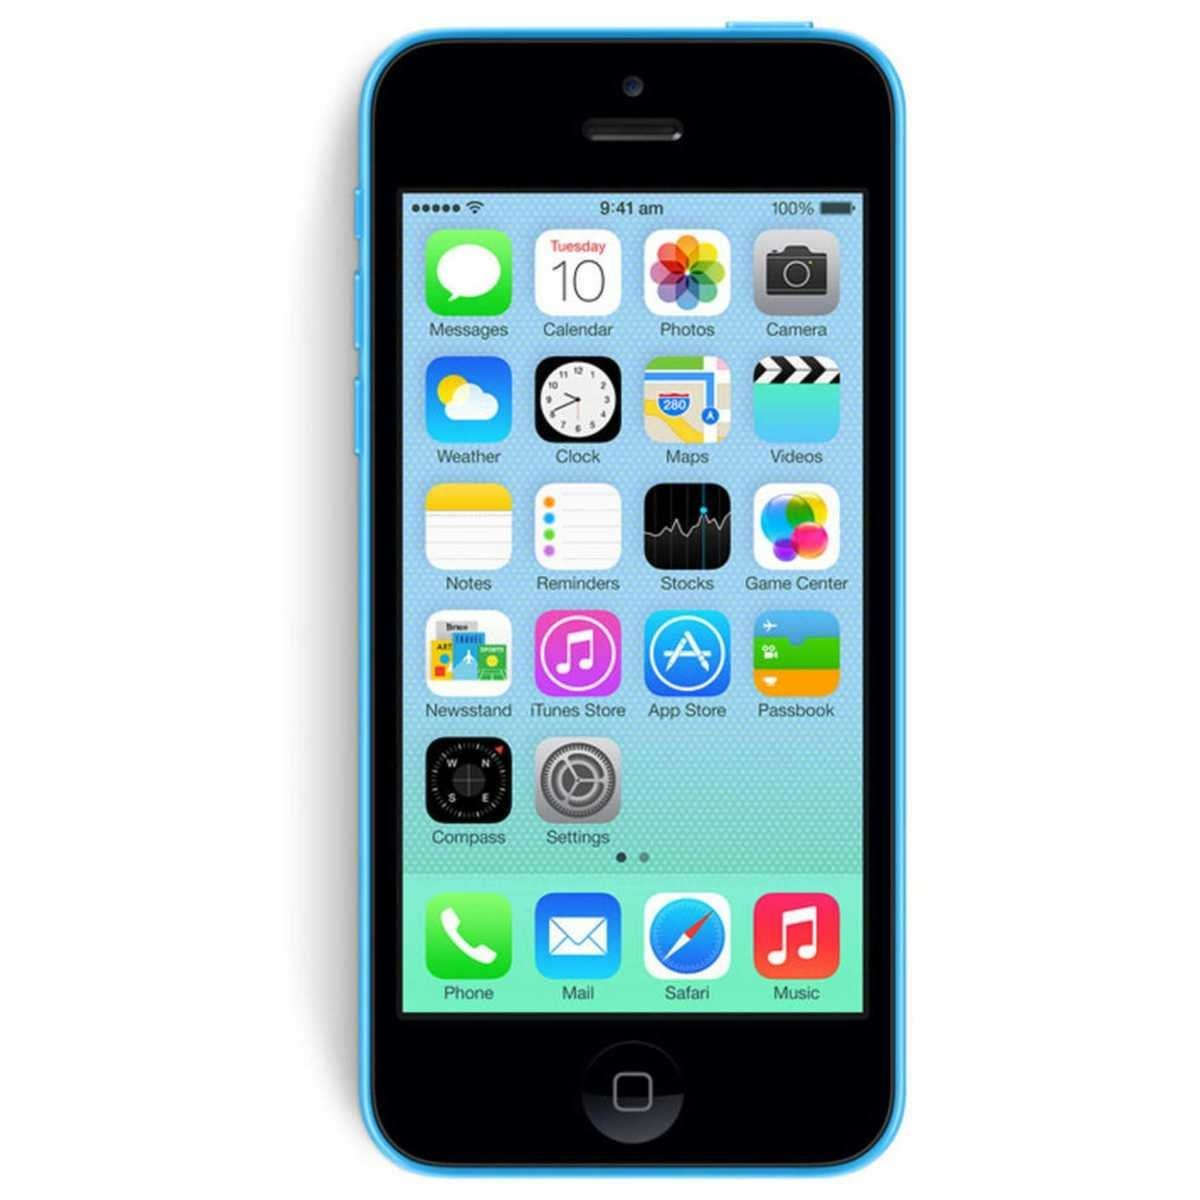 Apple iPhone 5C Refurbished Mobile Phone